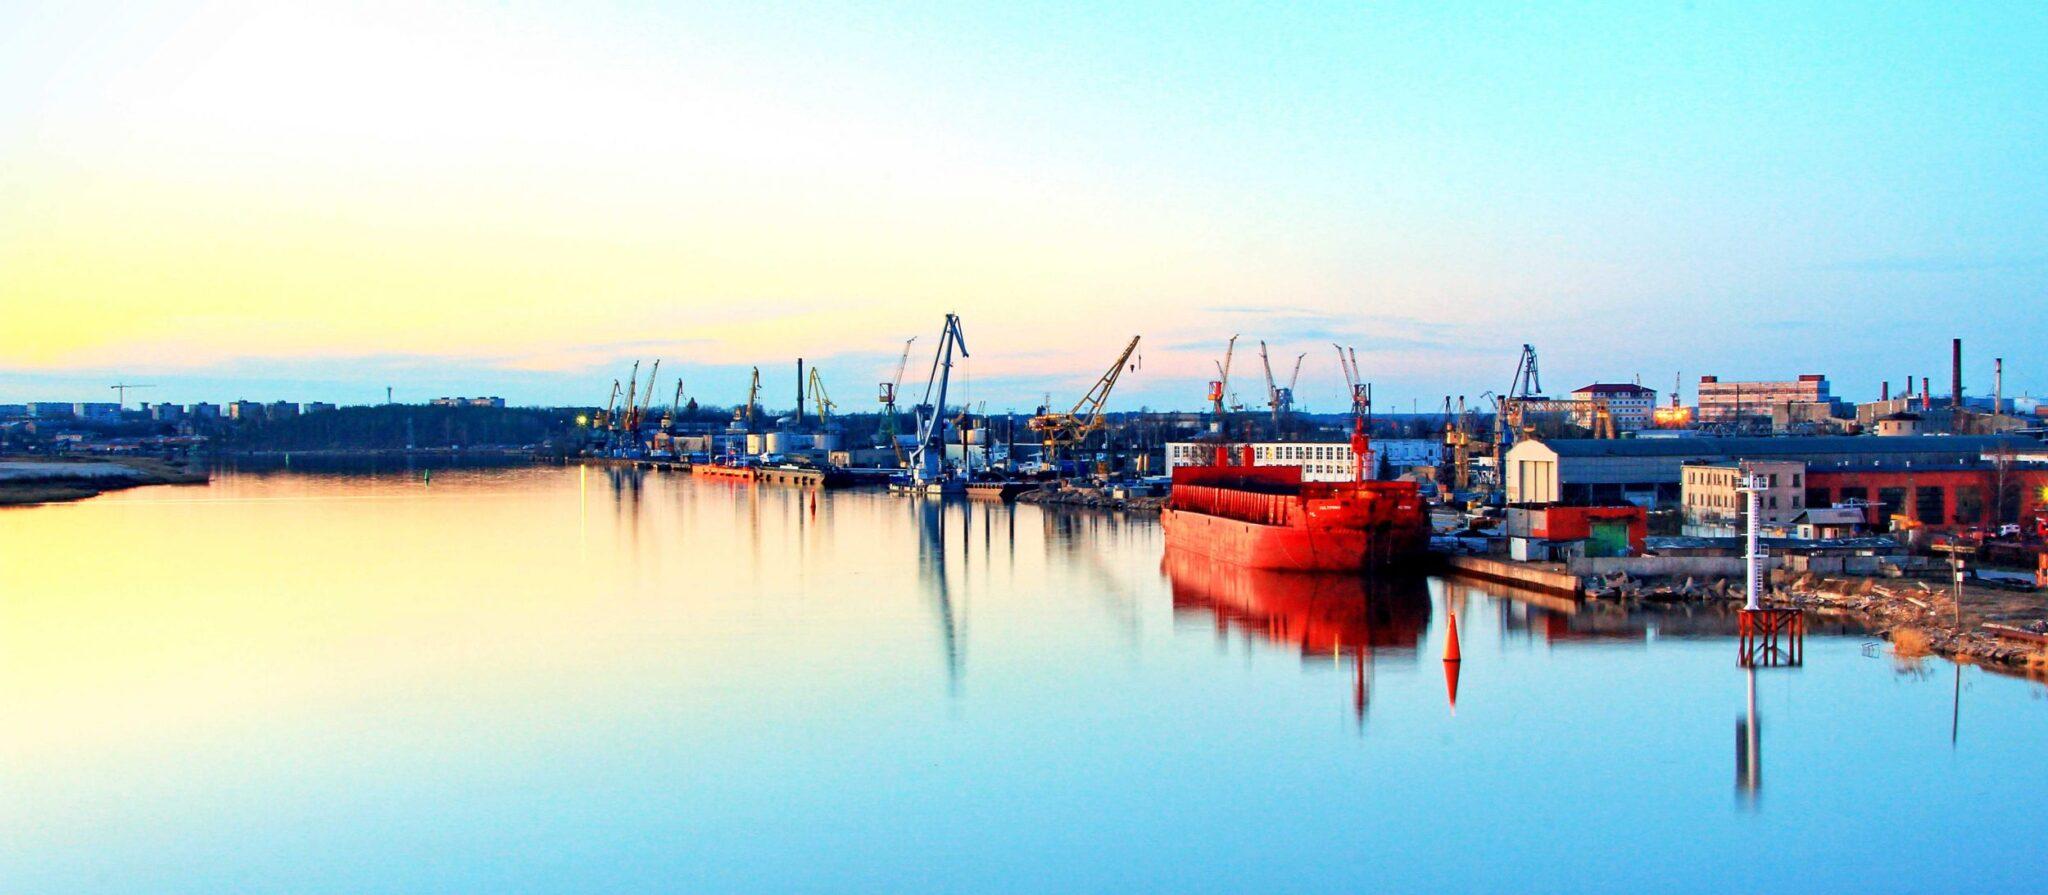 Seaman Memories. Calmest Port. Mirror-like.